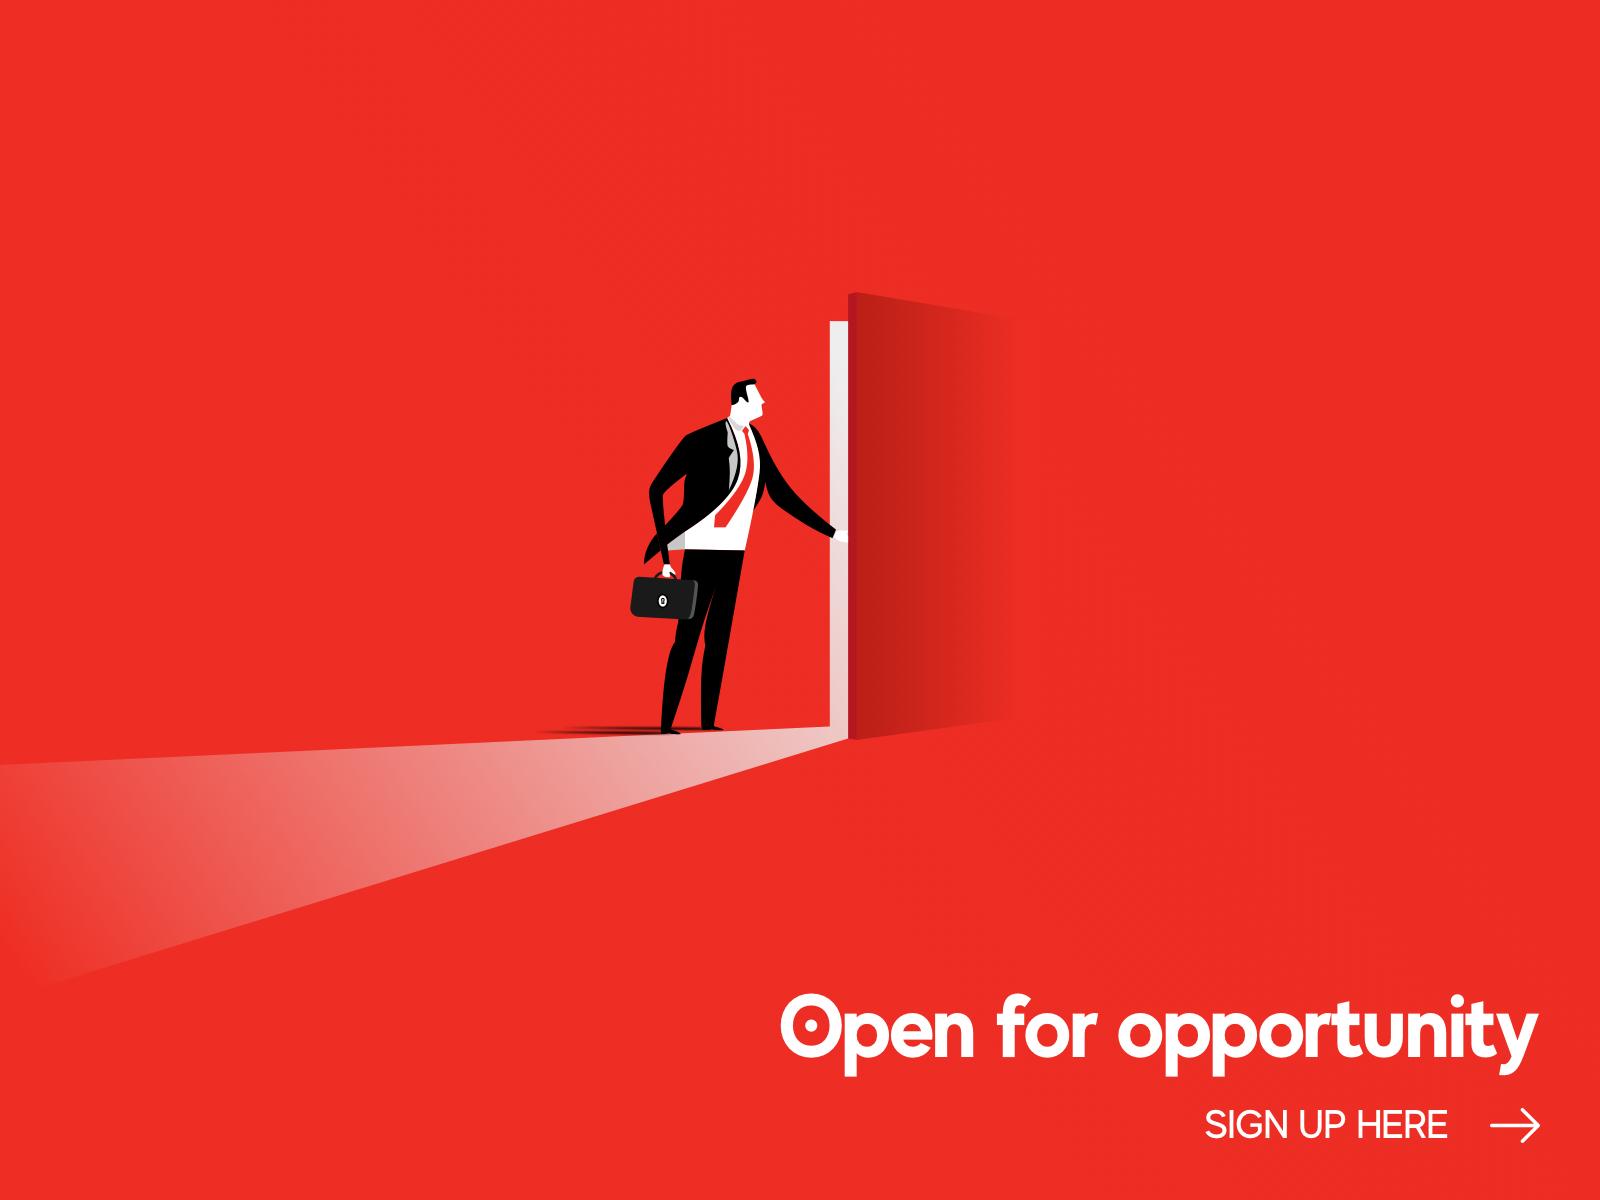 Open for opportunity